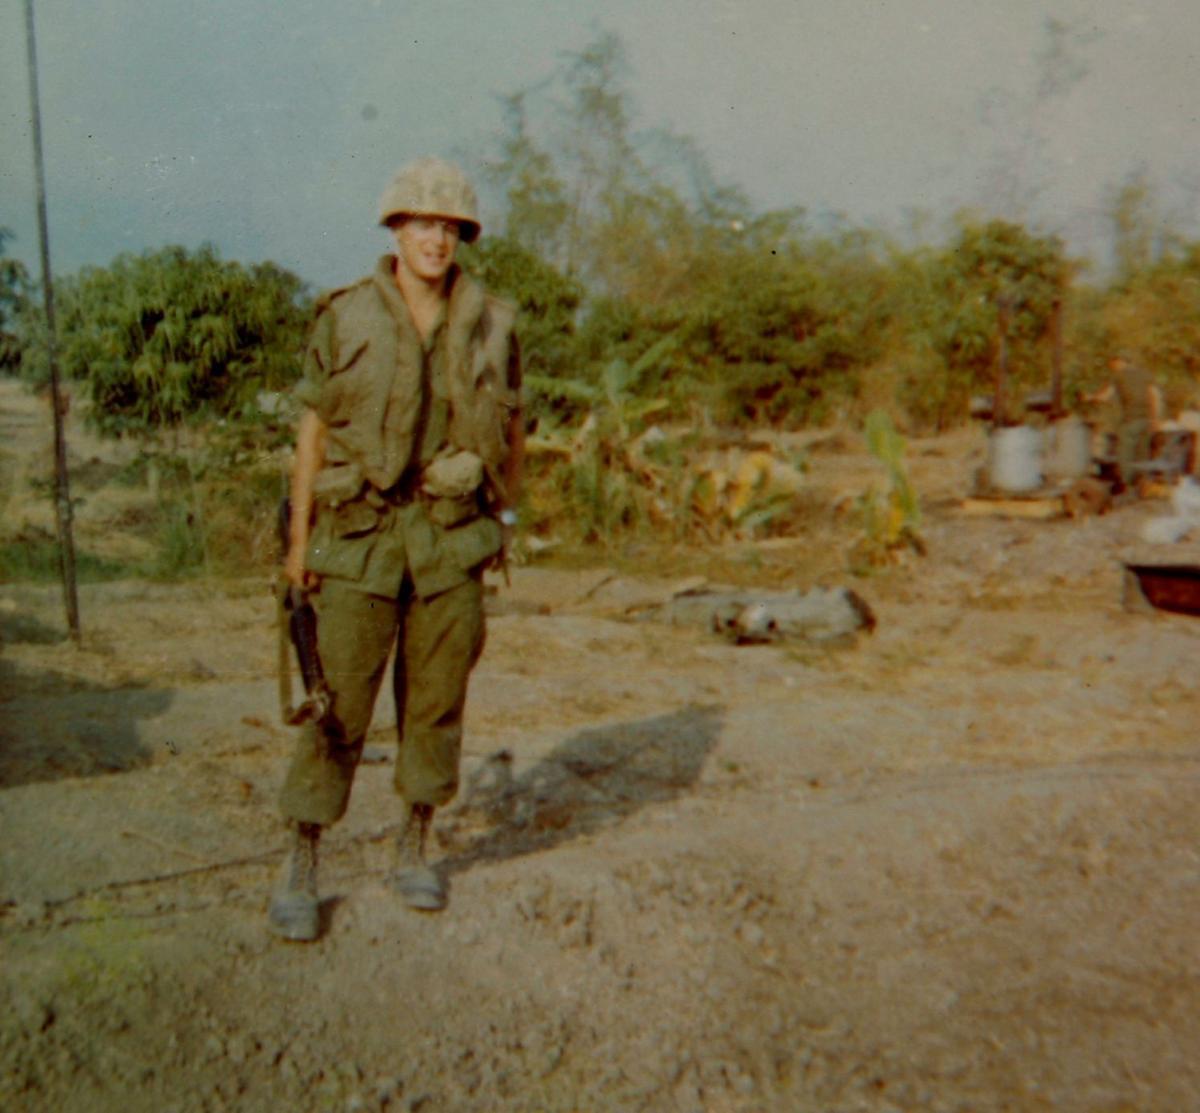 Vietnam veteran Dave Rye